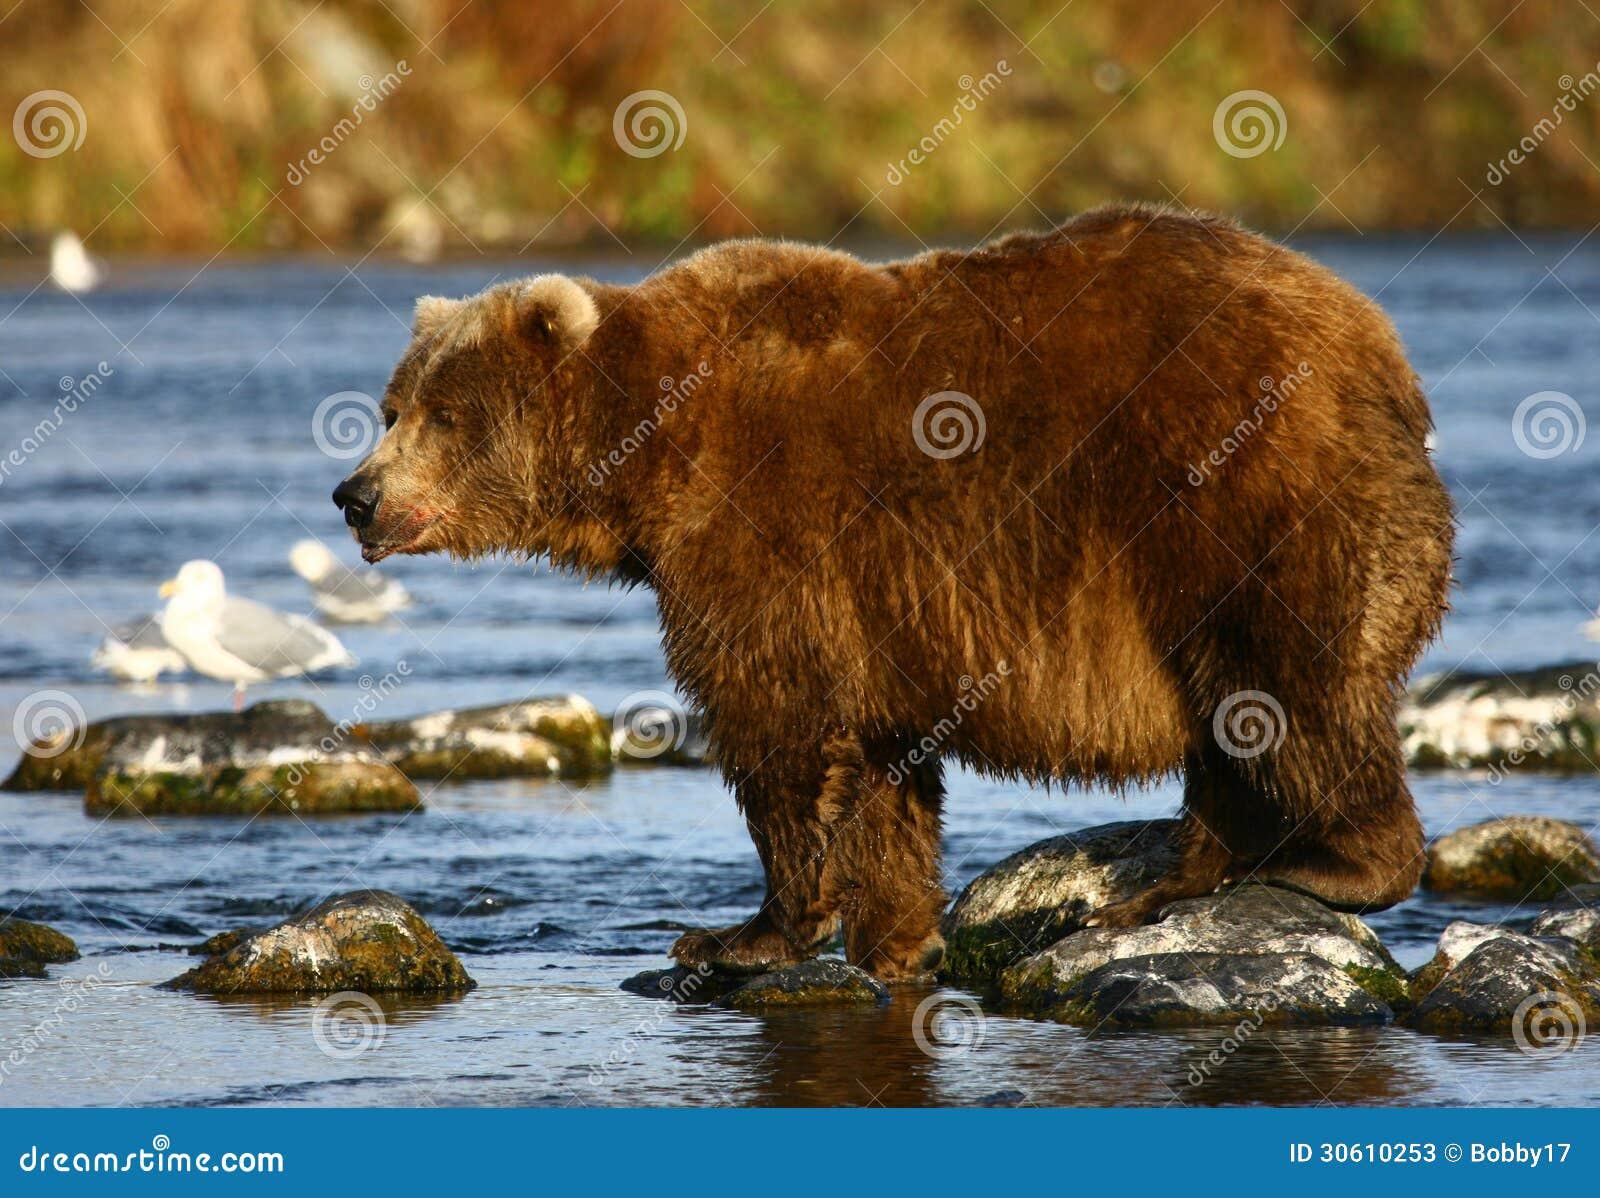 Kodiak brown bear stock image. Image of kodiak, heavy